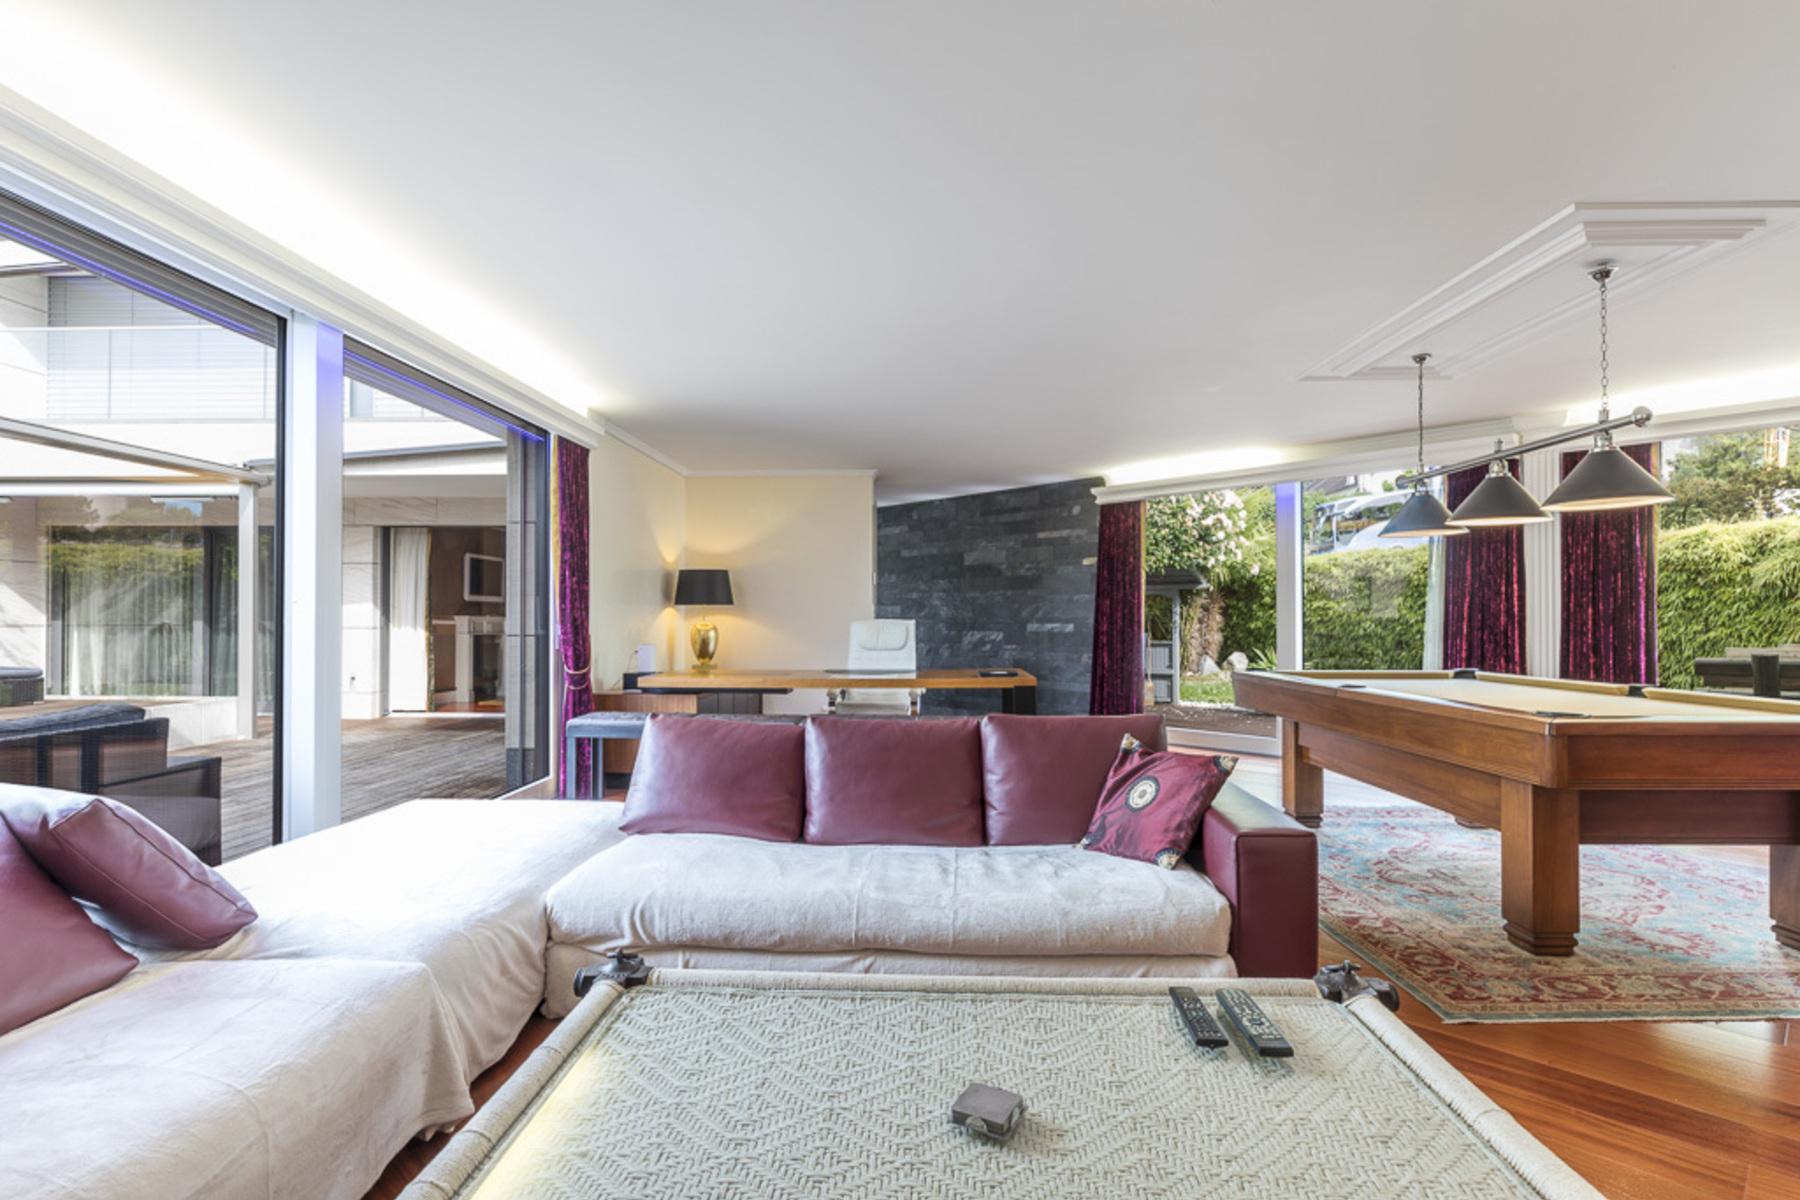 Piso por un Venta en Spacious 4.5-room apartment a stone's throw from the lake Villeneuve, Villeneuve Vd, Vaud, 1844 Suiza